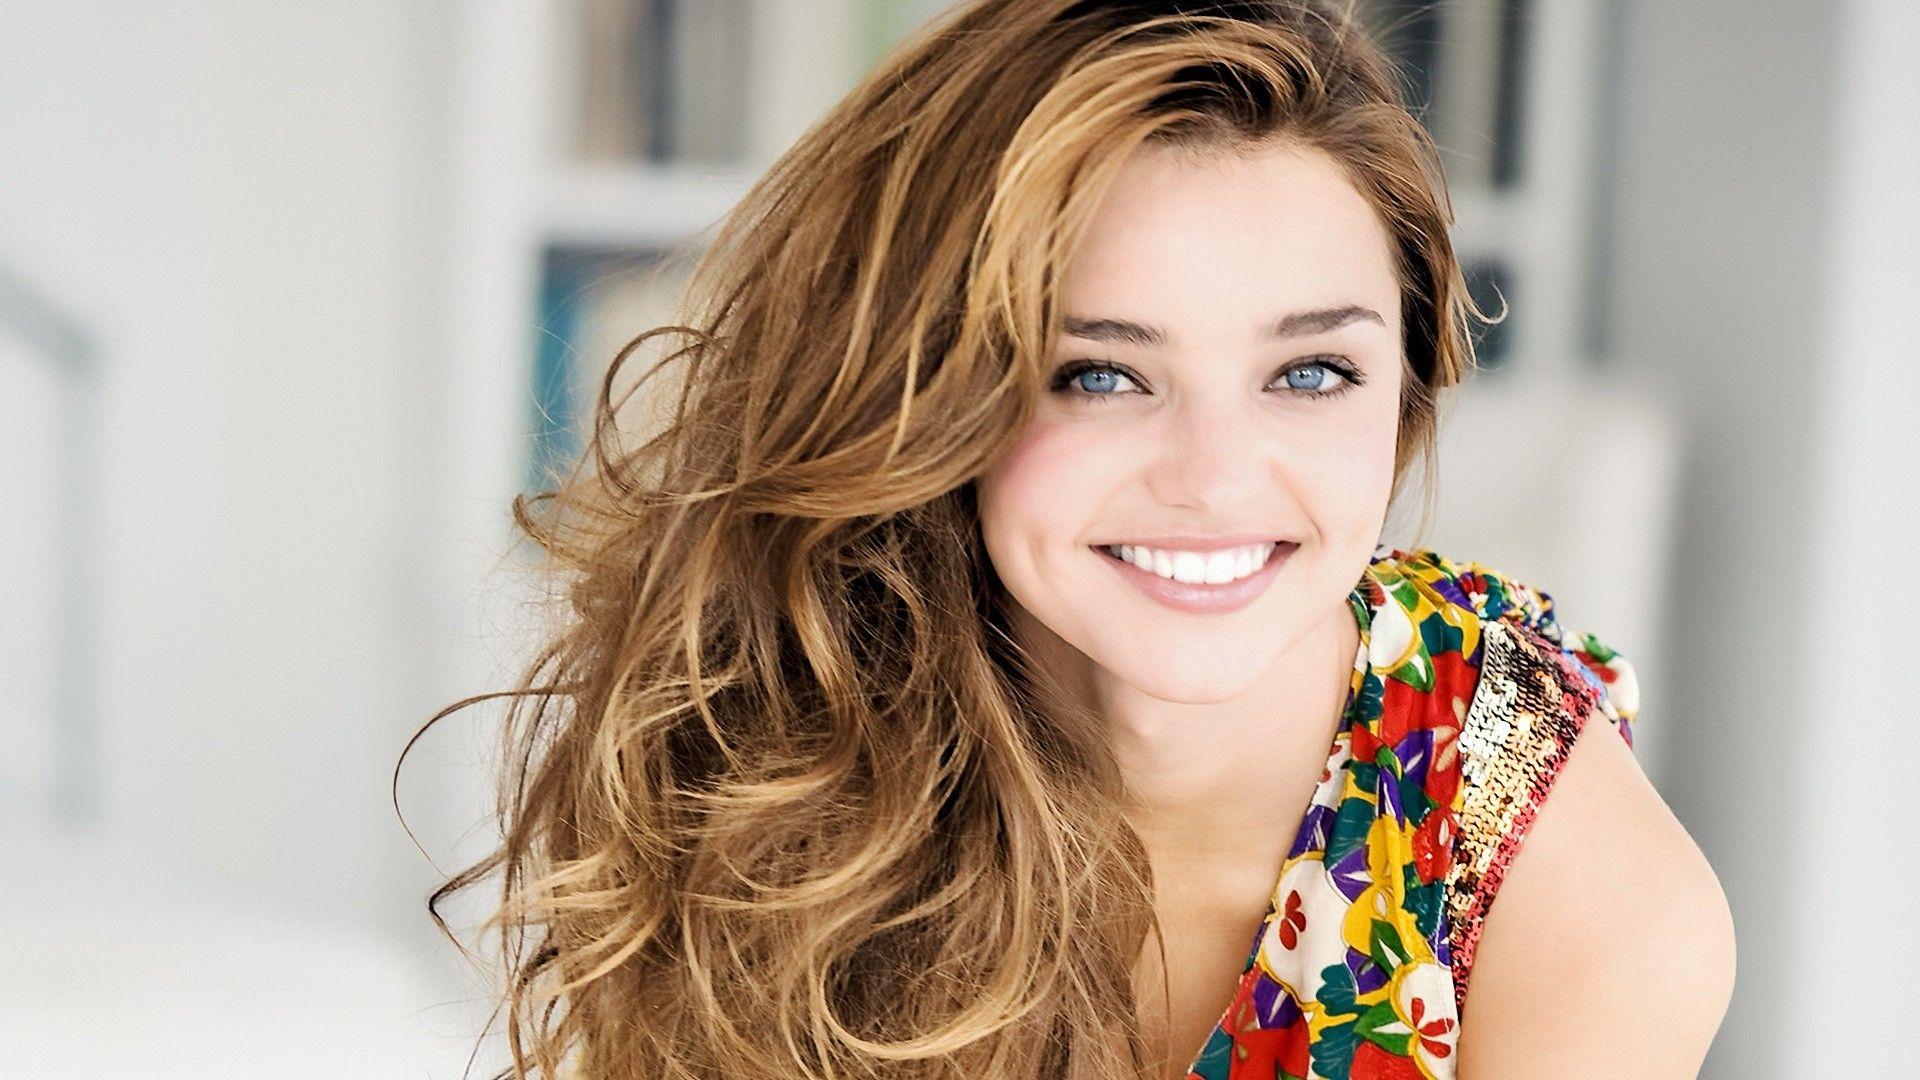 women miranda kerr celebrity faces supermodels - wallpaper (#2902394